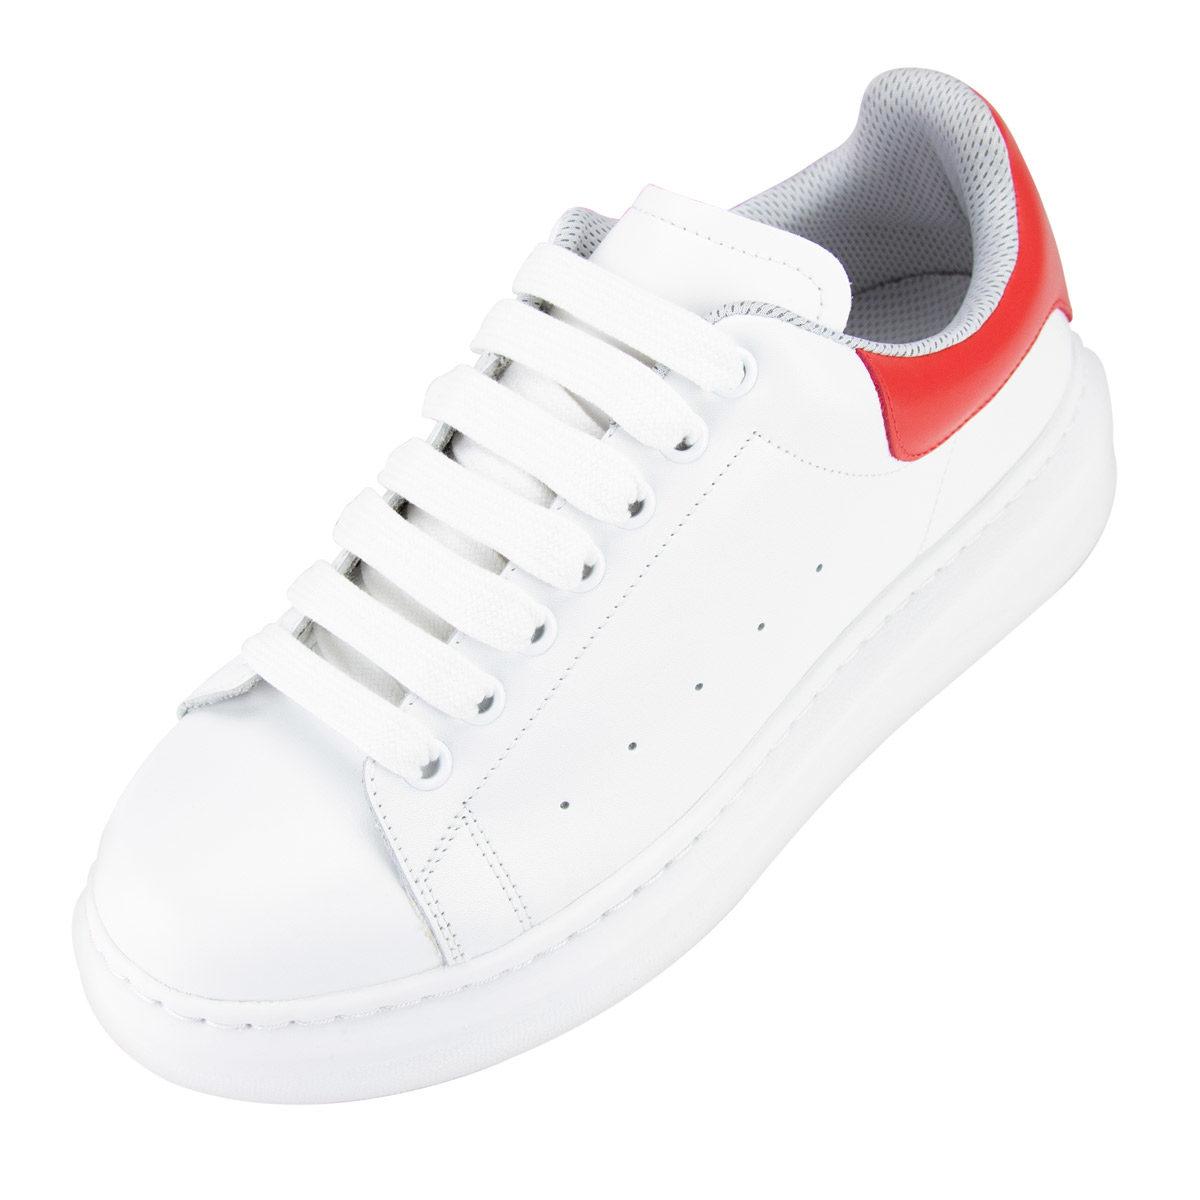 CHI Footwear for Men Sapphire Red CHI Footwear